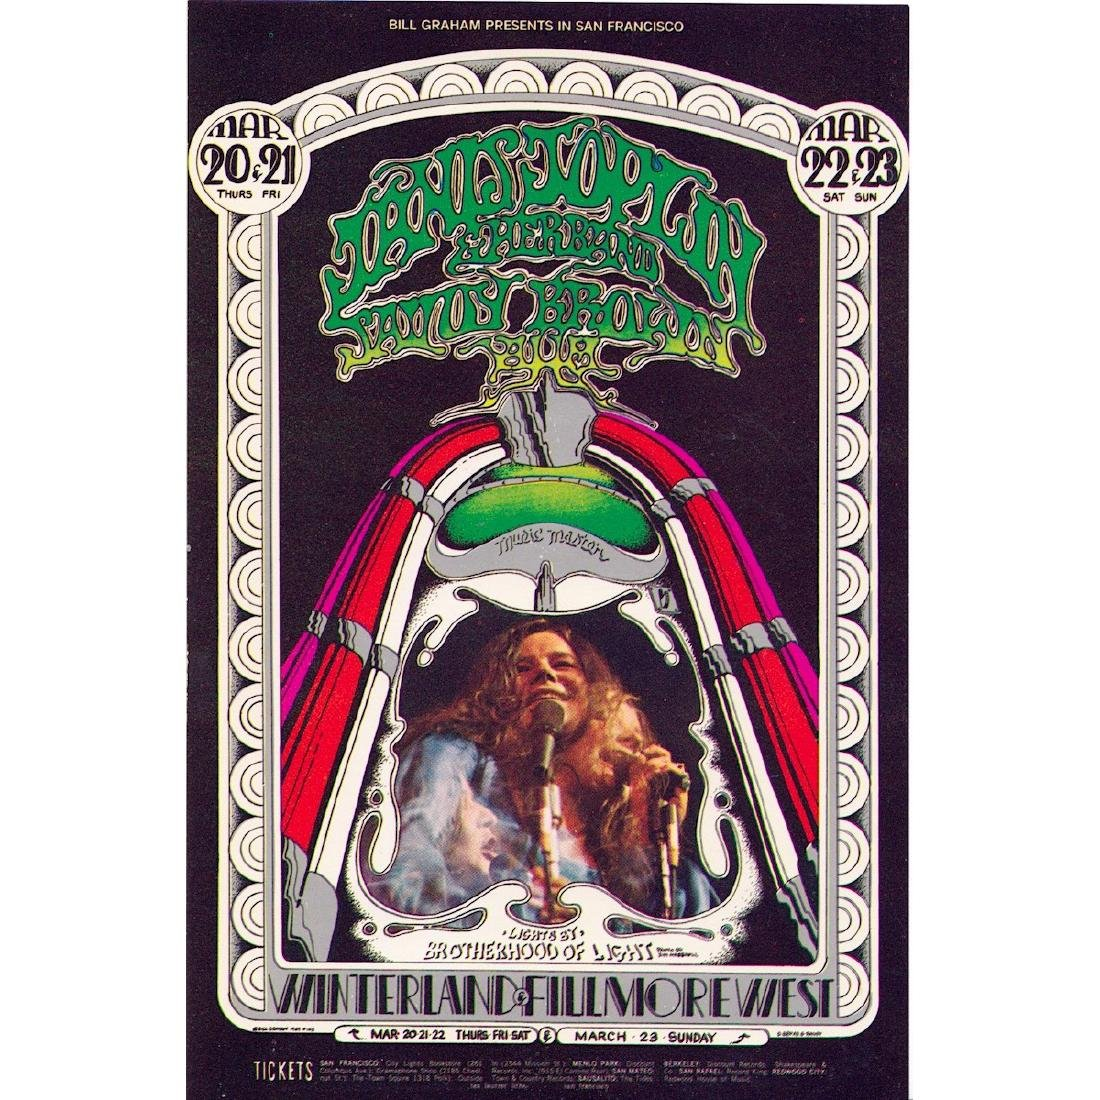 Janis Joplin - 1969 Concert Handbill